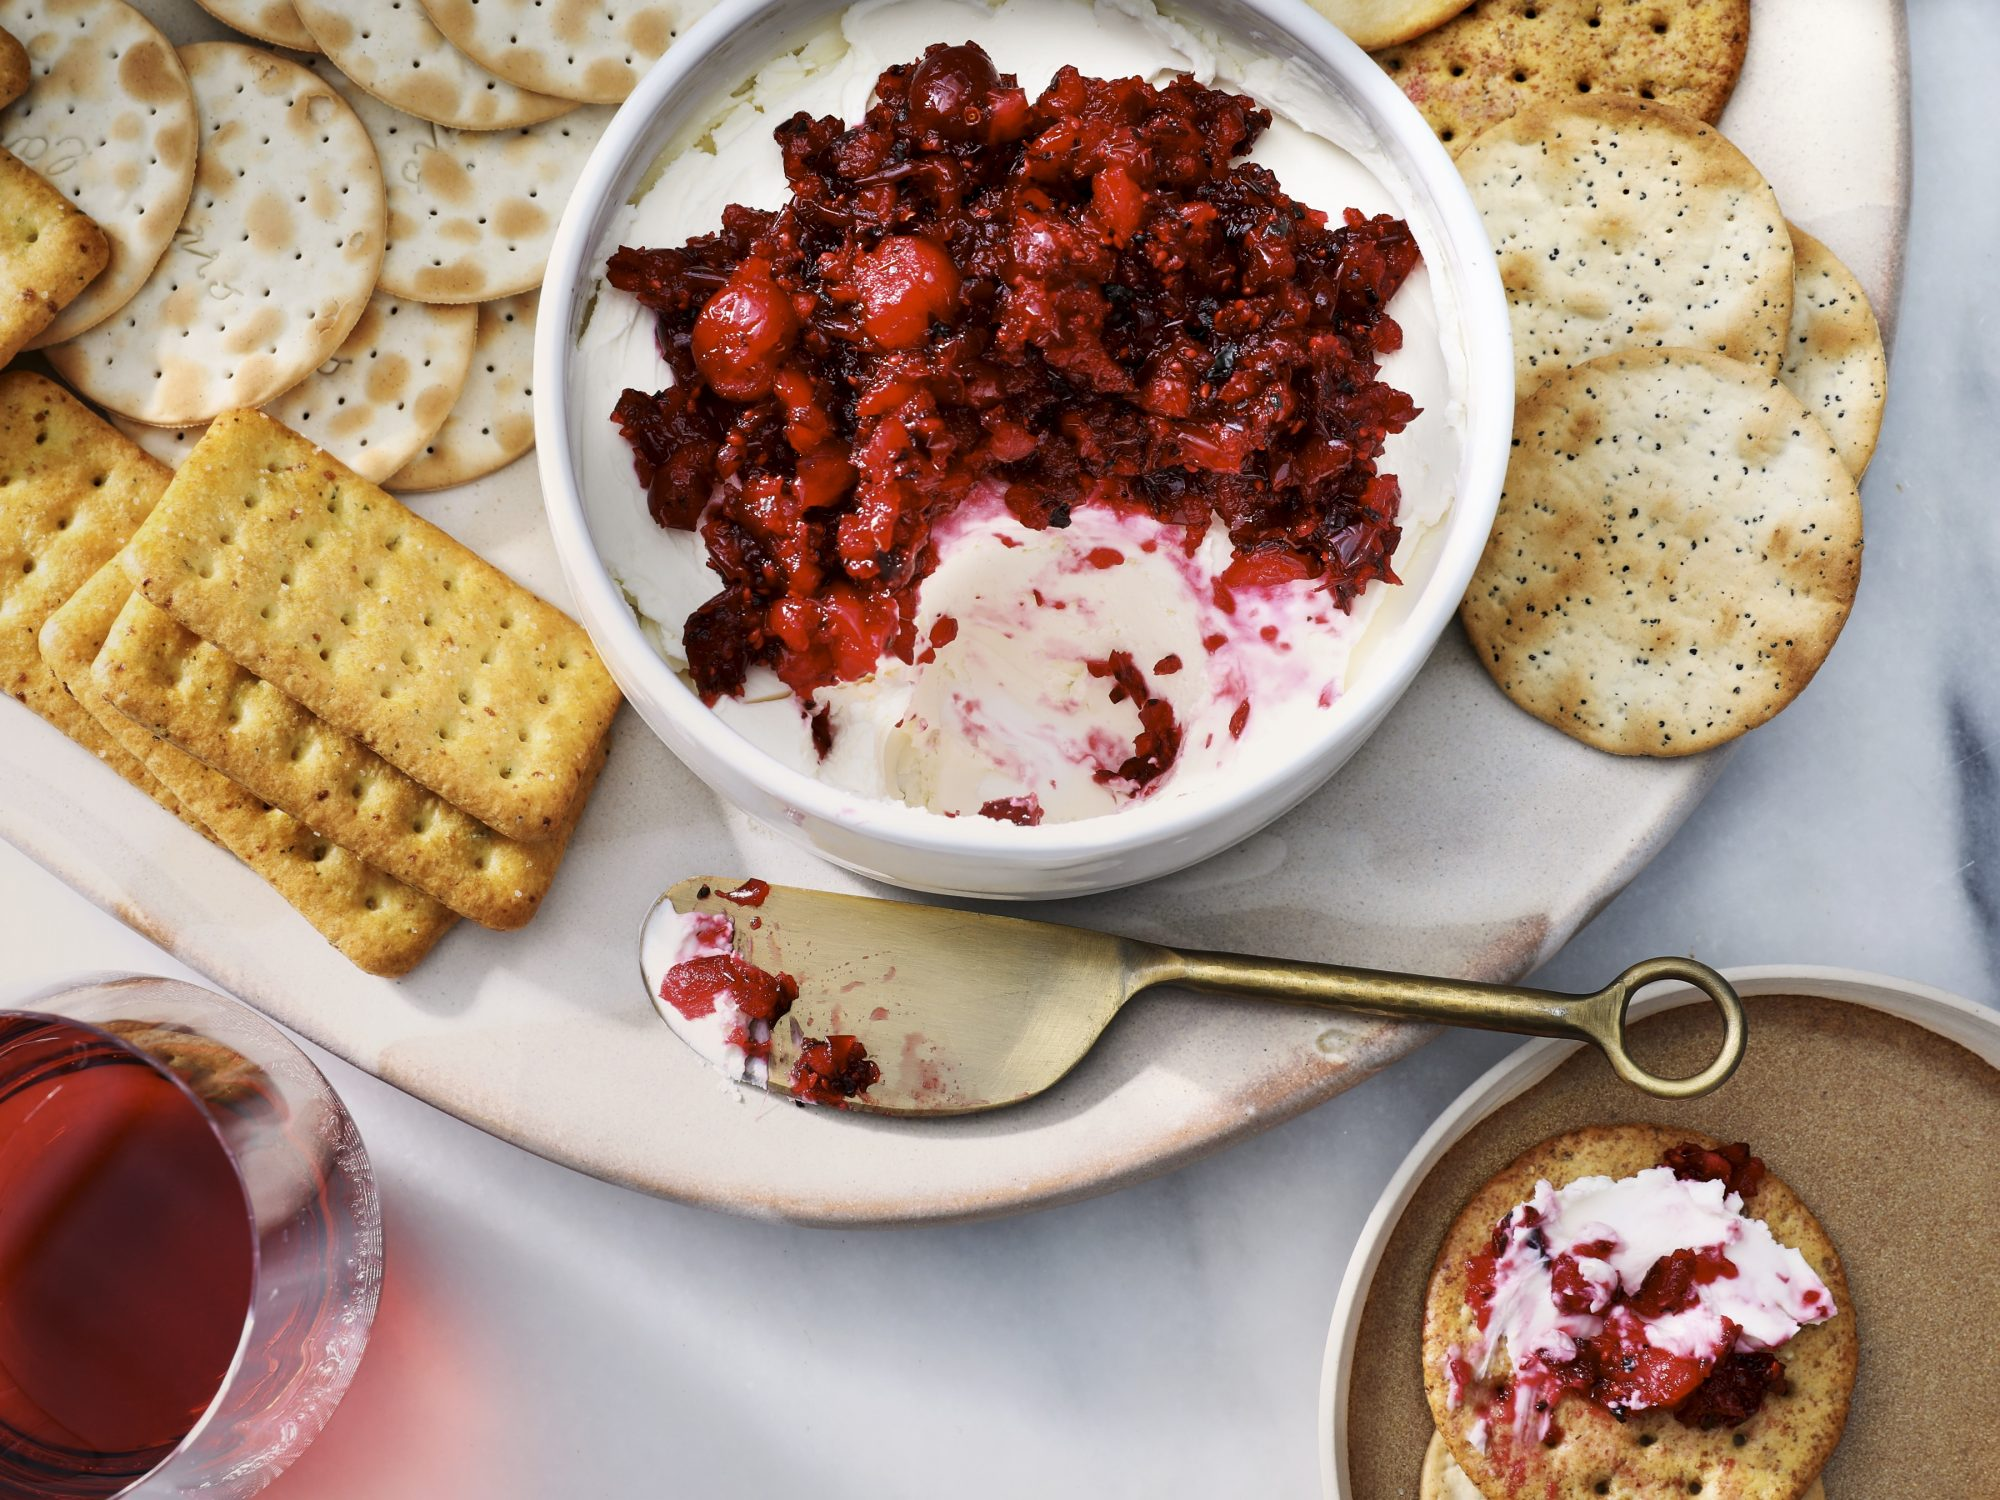 Cranberry-Jalapeño Cream Cheese Dip